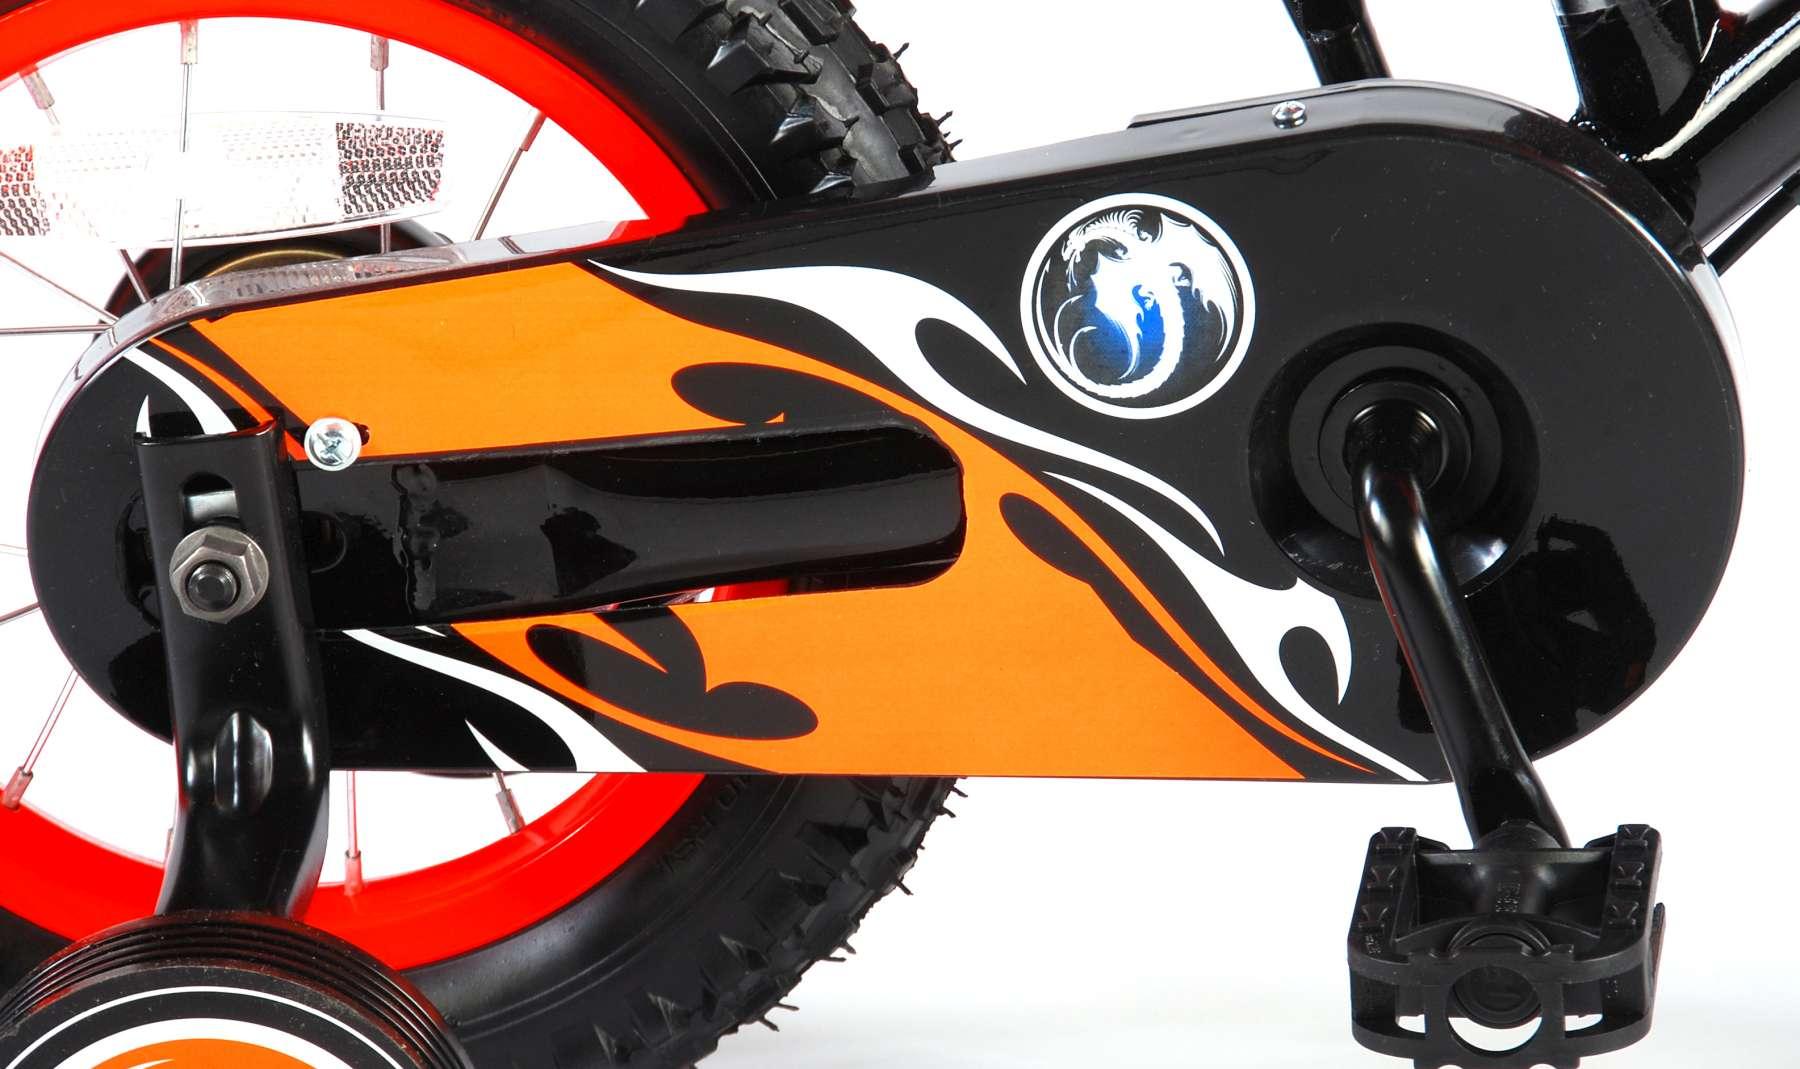 Bicicleta Motorbike de 12 pulgadas Naranja - cadena